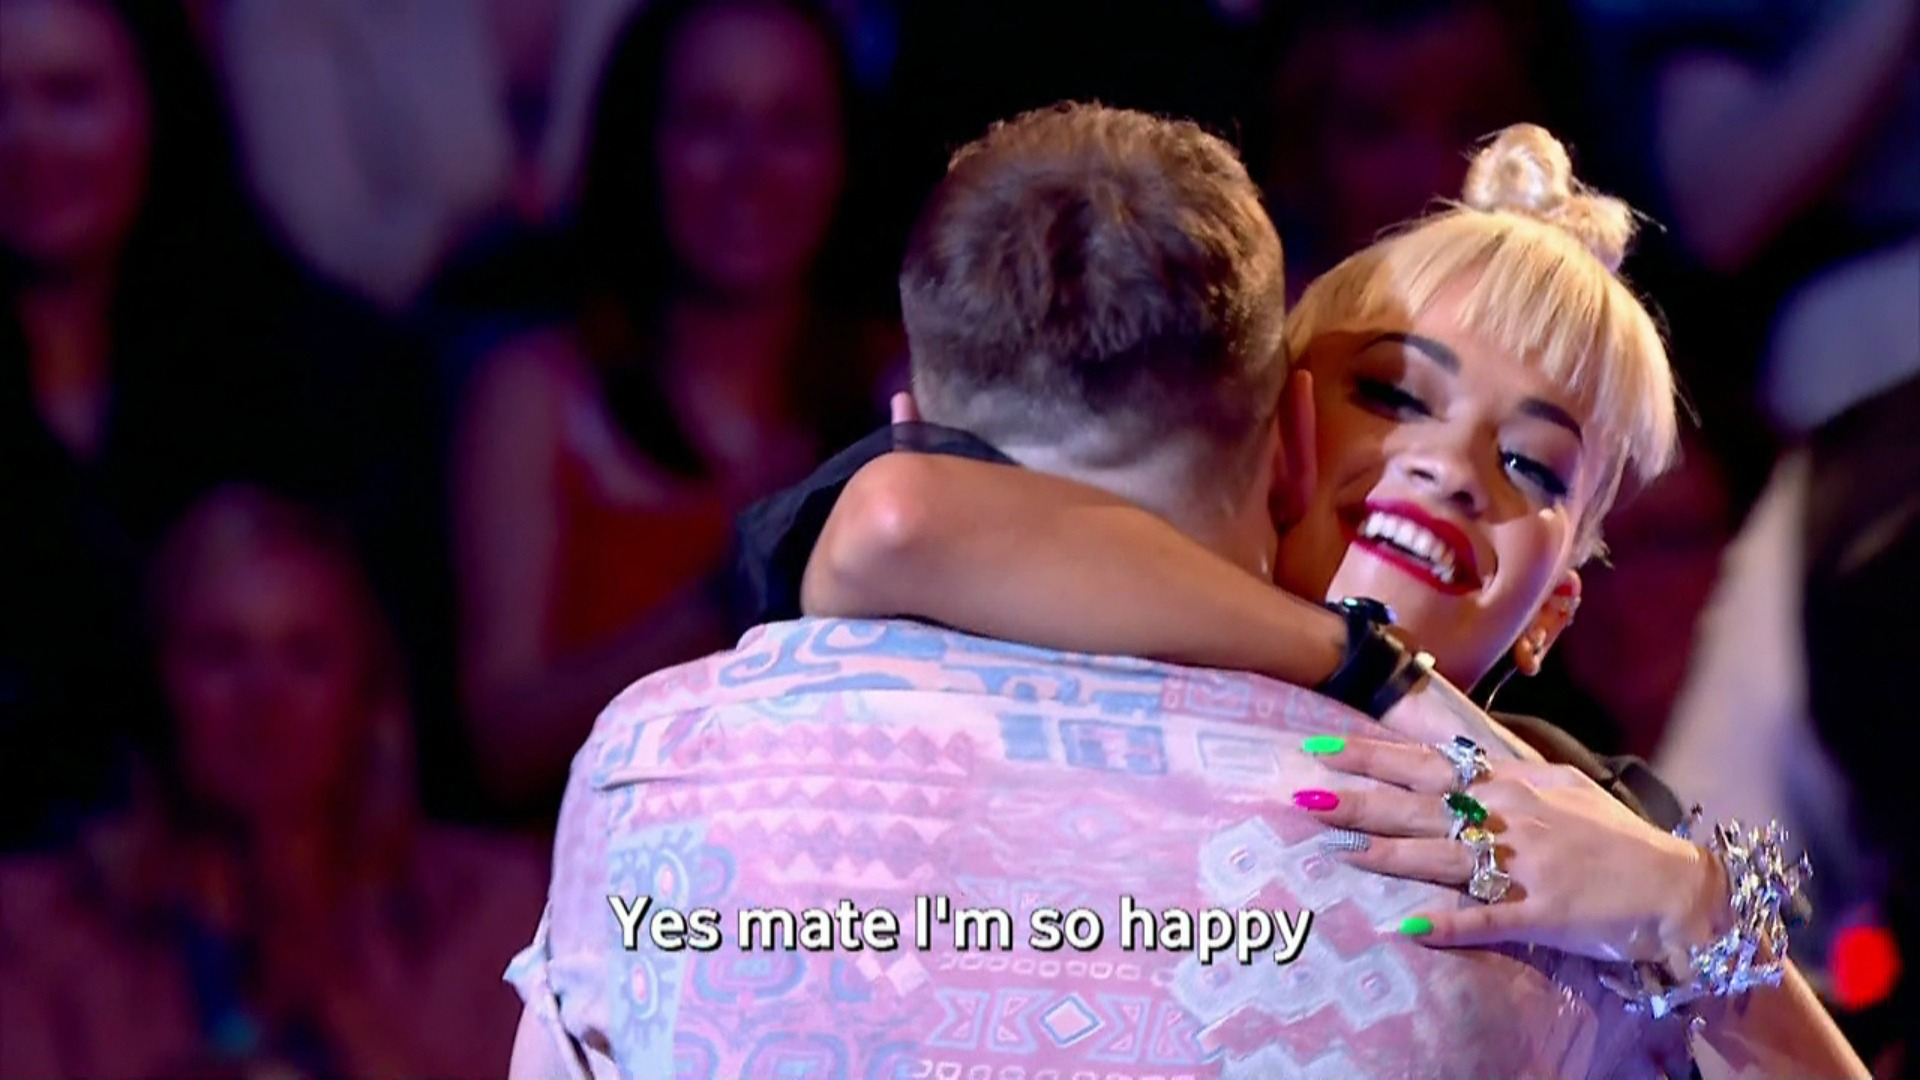 Rita Ora hugs contestant on The Voice UK